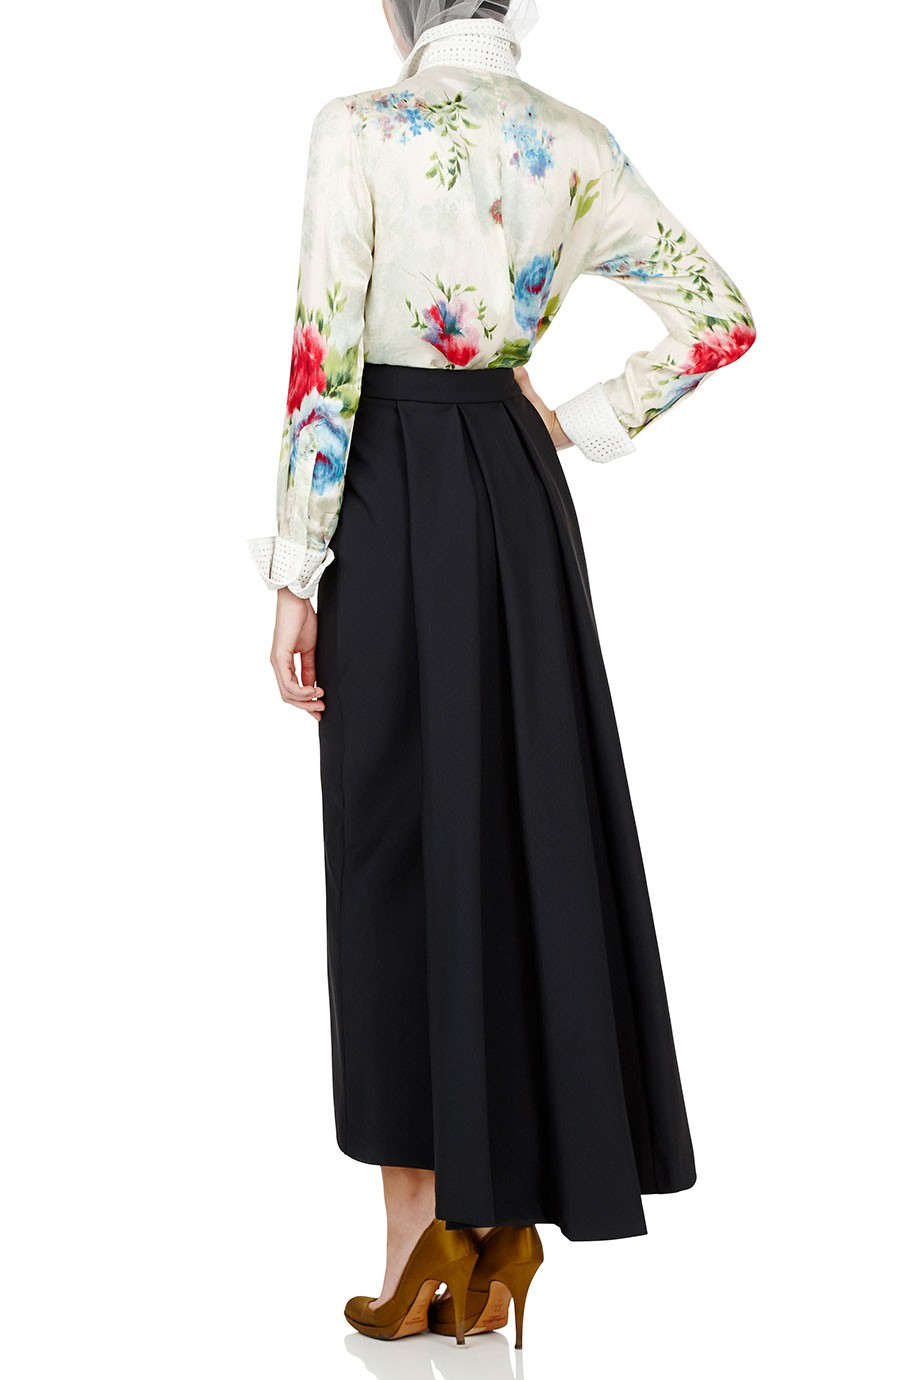 Diana-Kotb-Time-Piece-Skirt-Gamne-Maker-Shirt-02